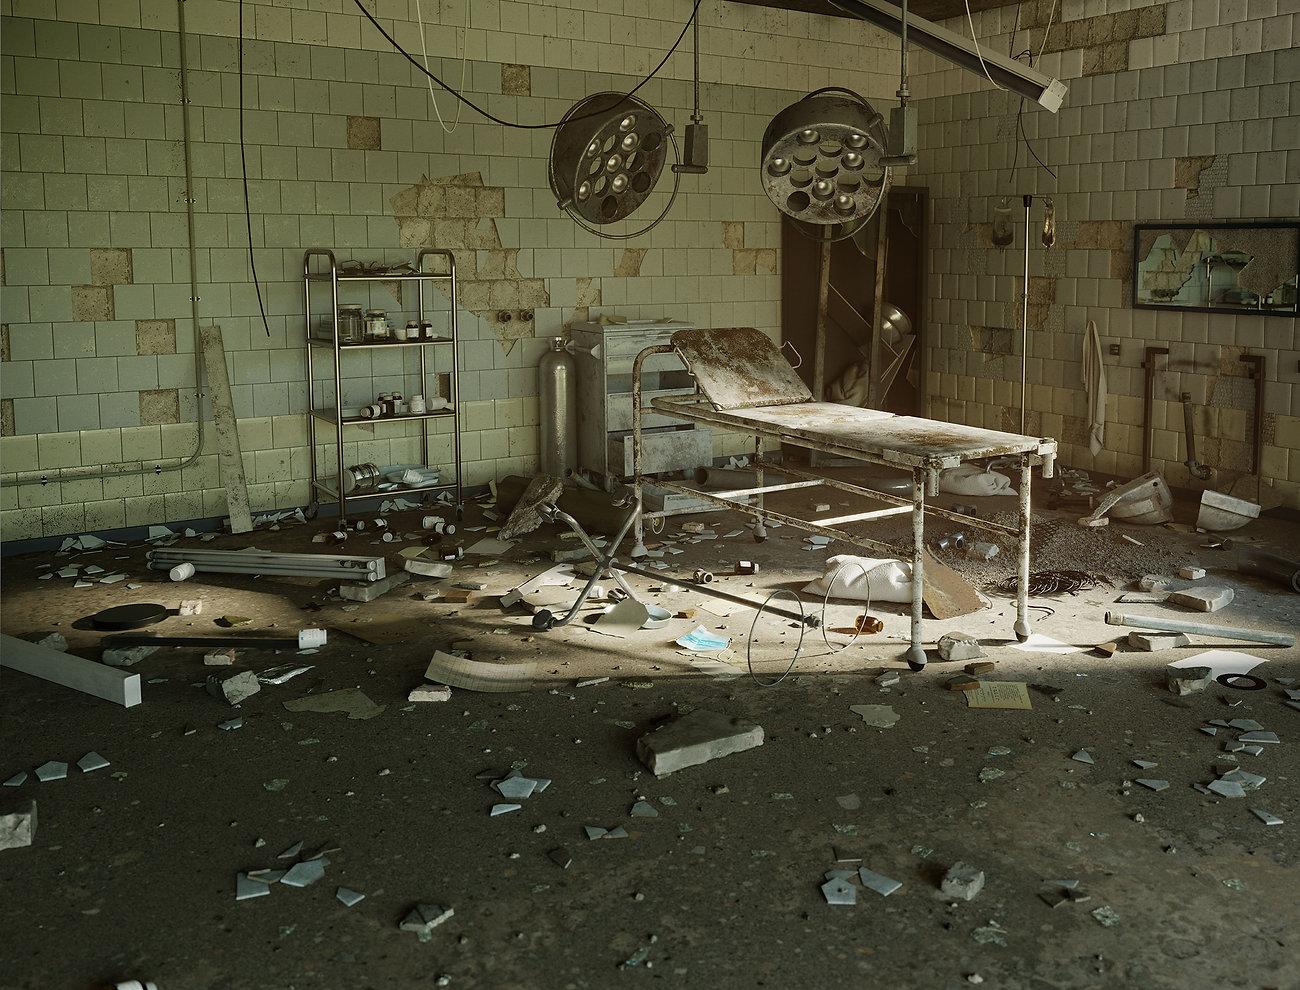 Transplant_Bombed.jpg